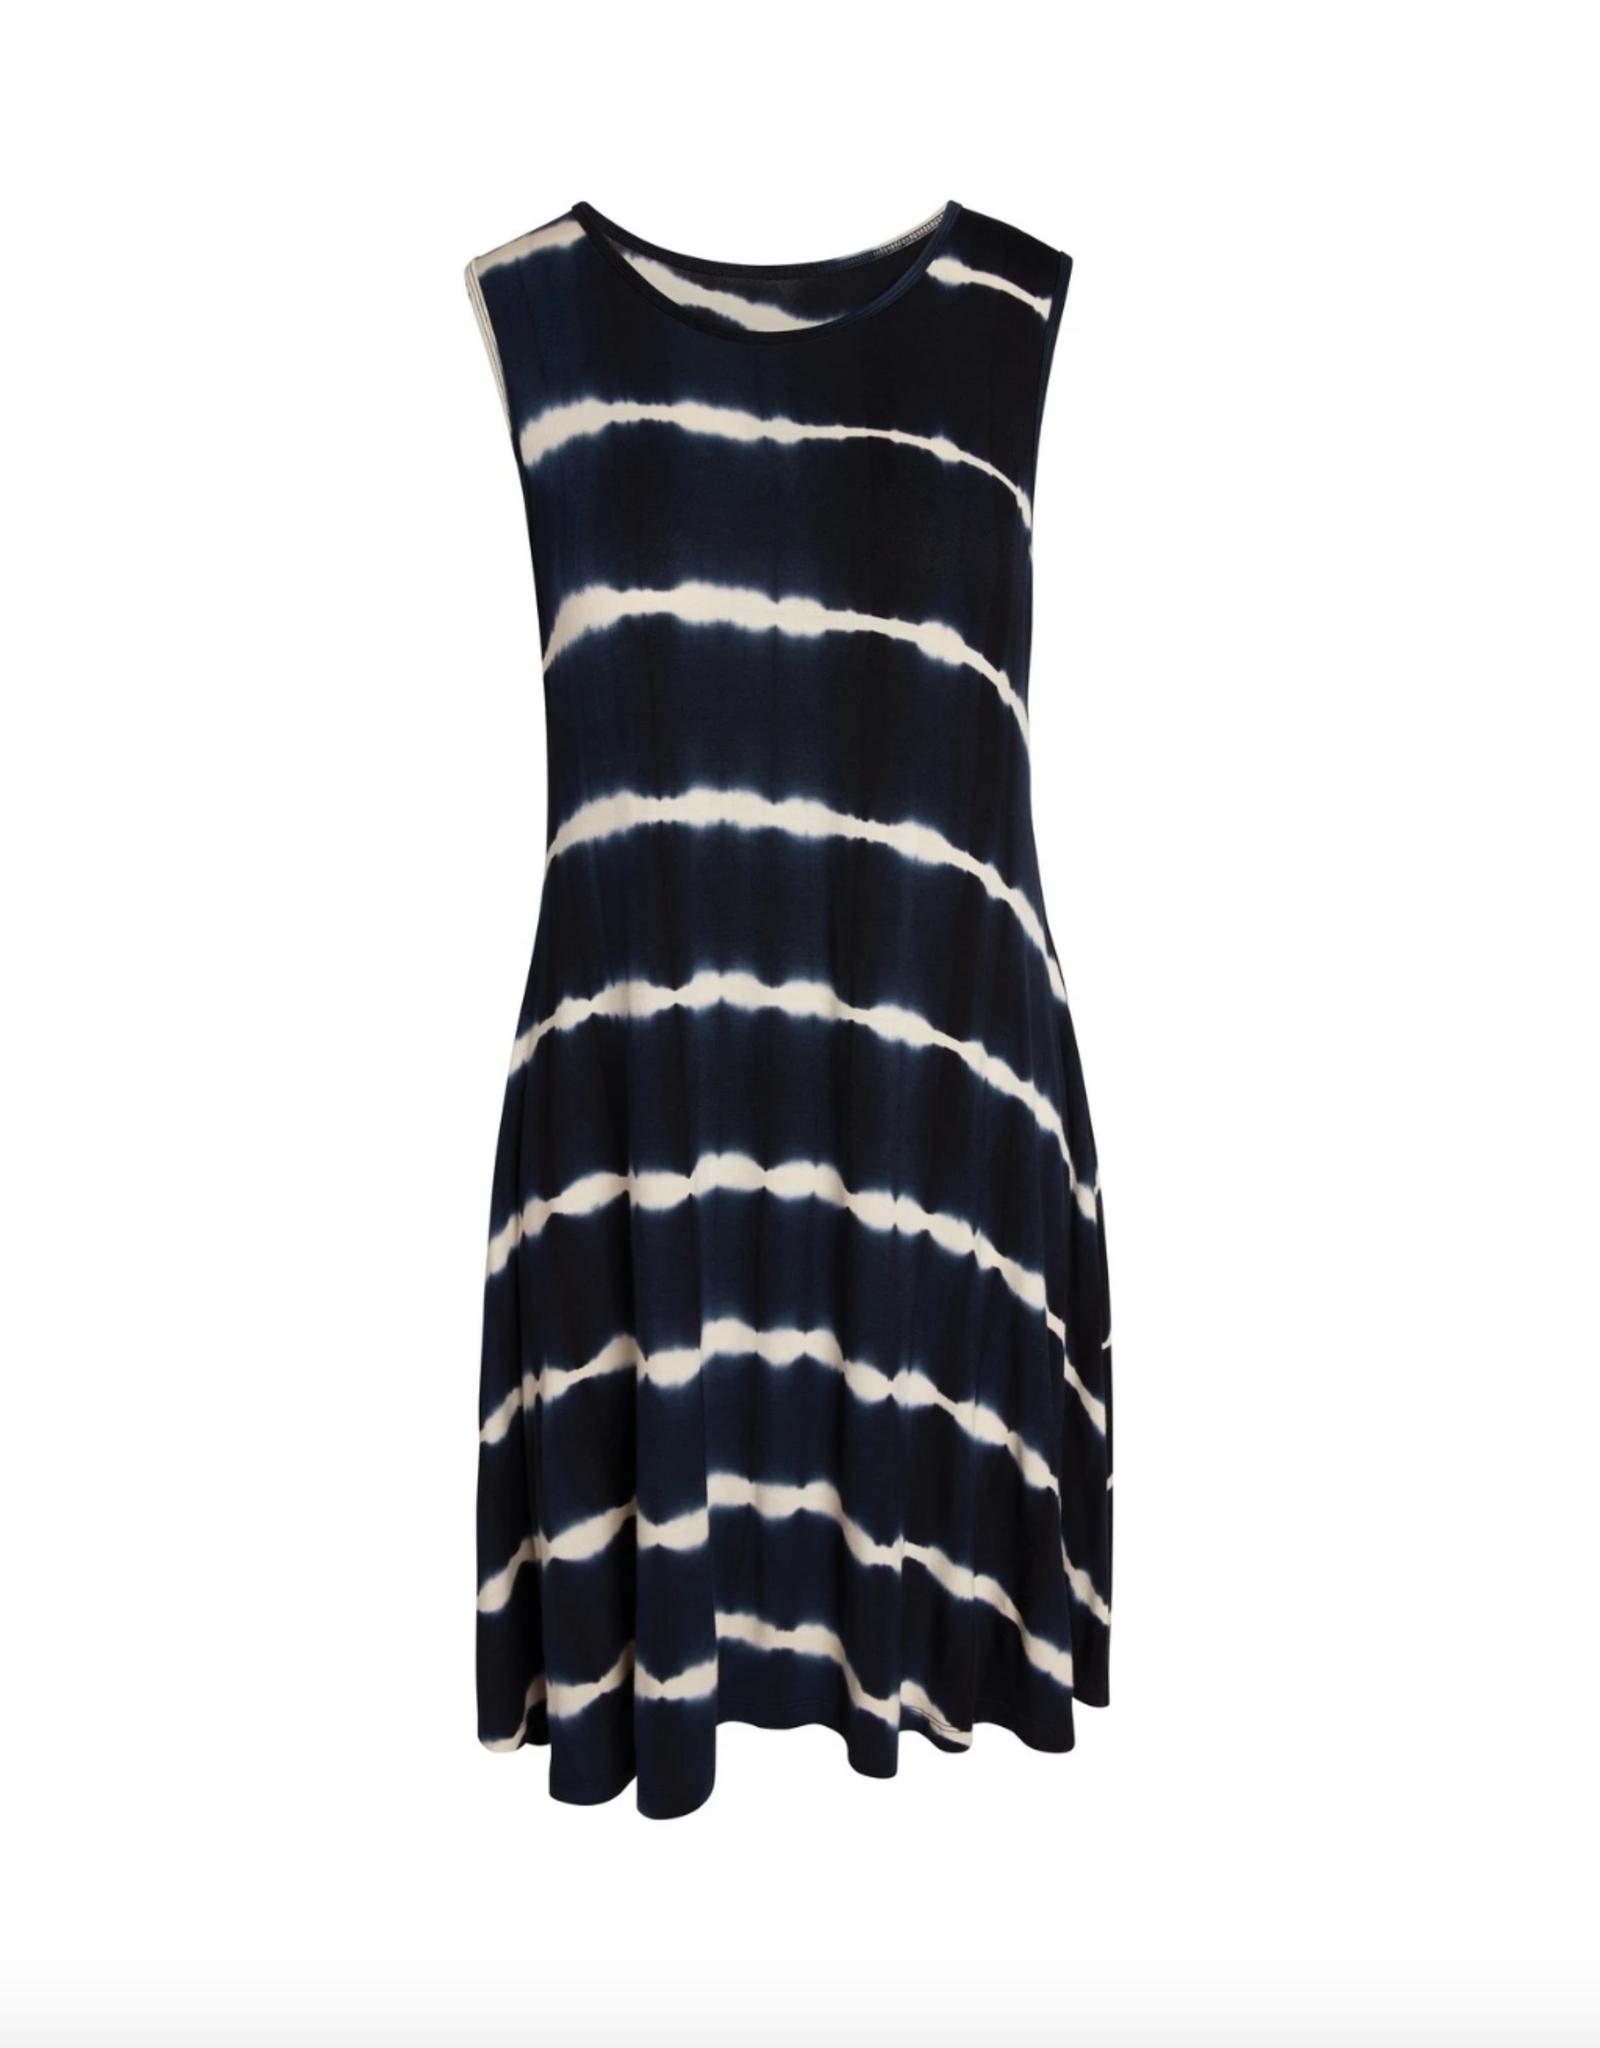 Accent Accessories Accent - Bree Tie-Dye Pocket Dress Navy